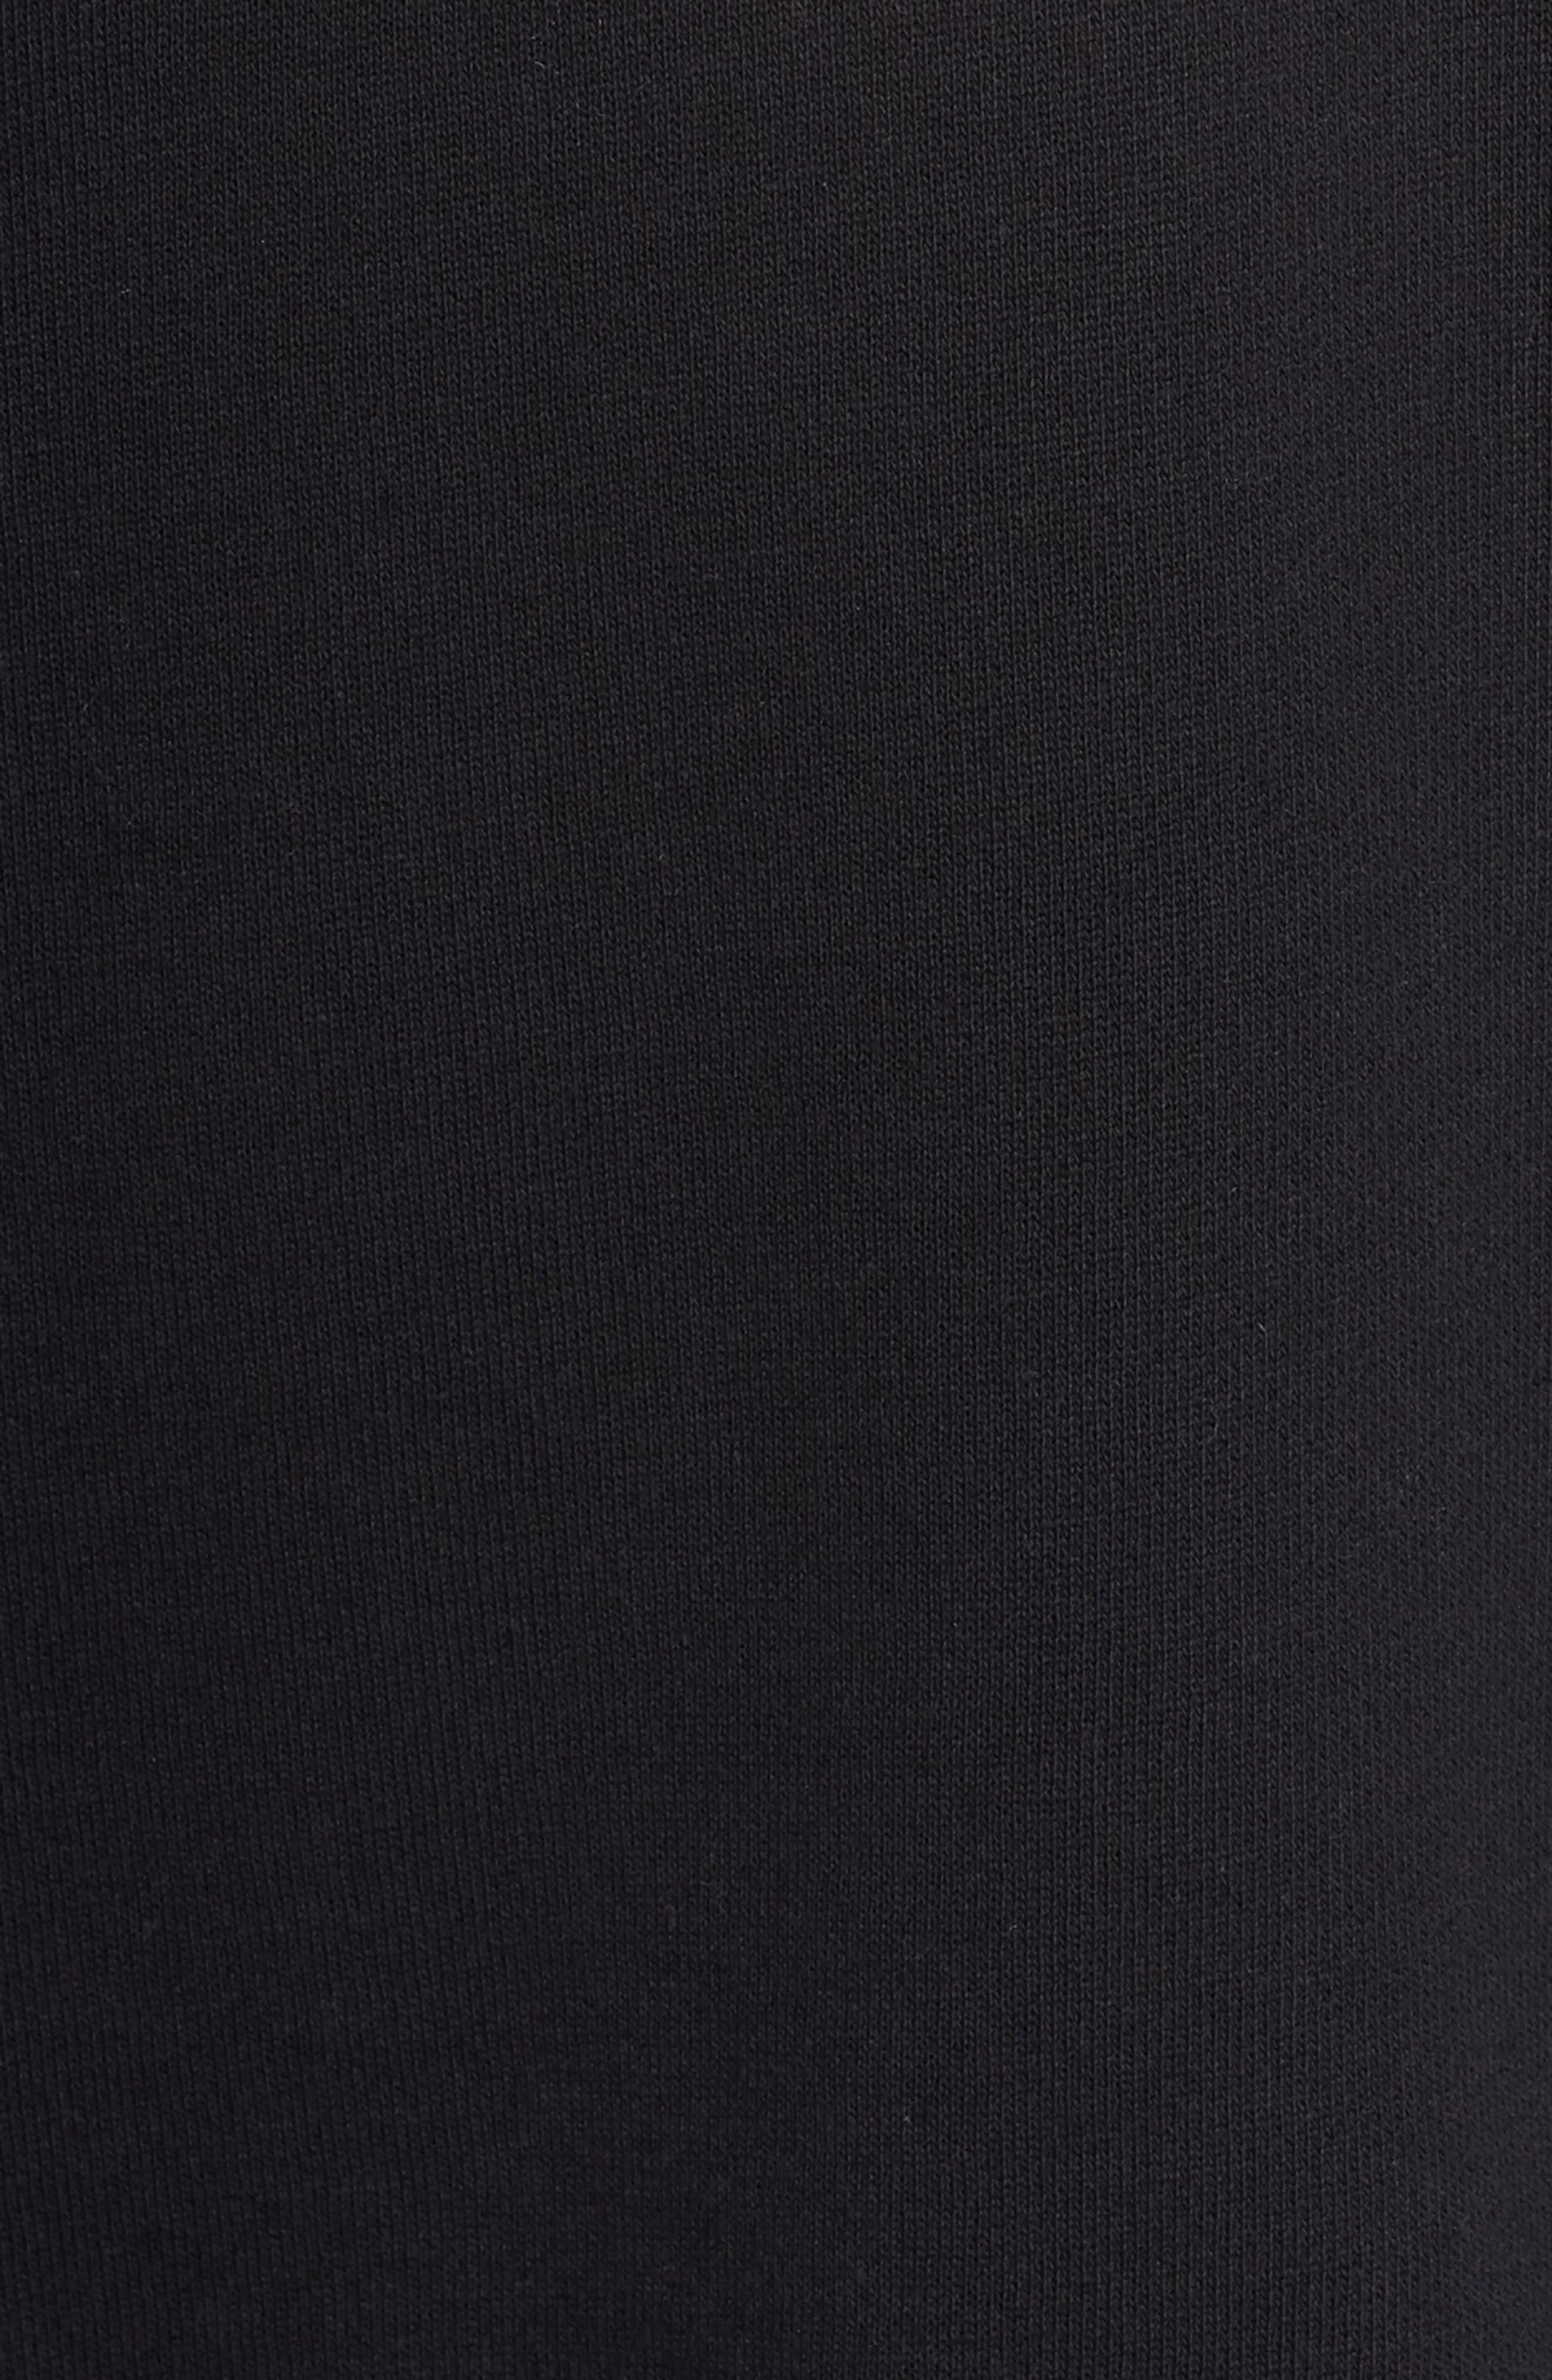 Archive Sweatshirt,                             Alternate thumbnail 6, color,                             BLACK/ BLACK/ BLACK